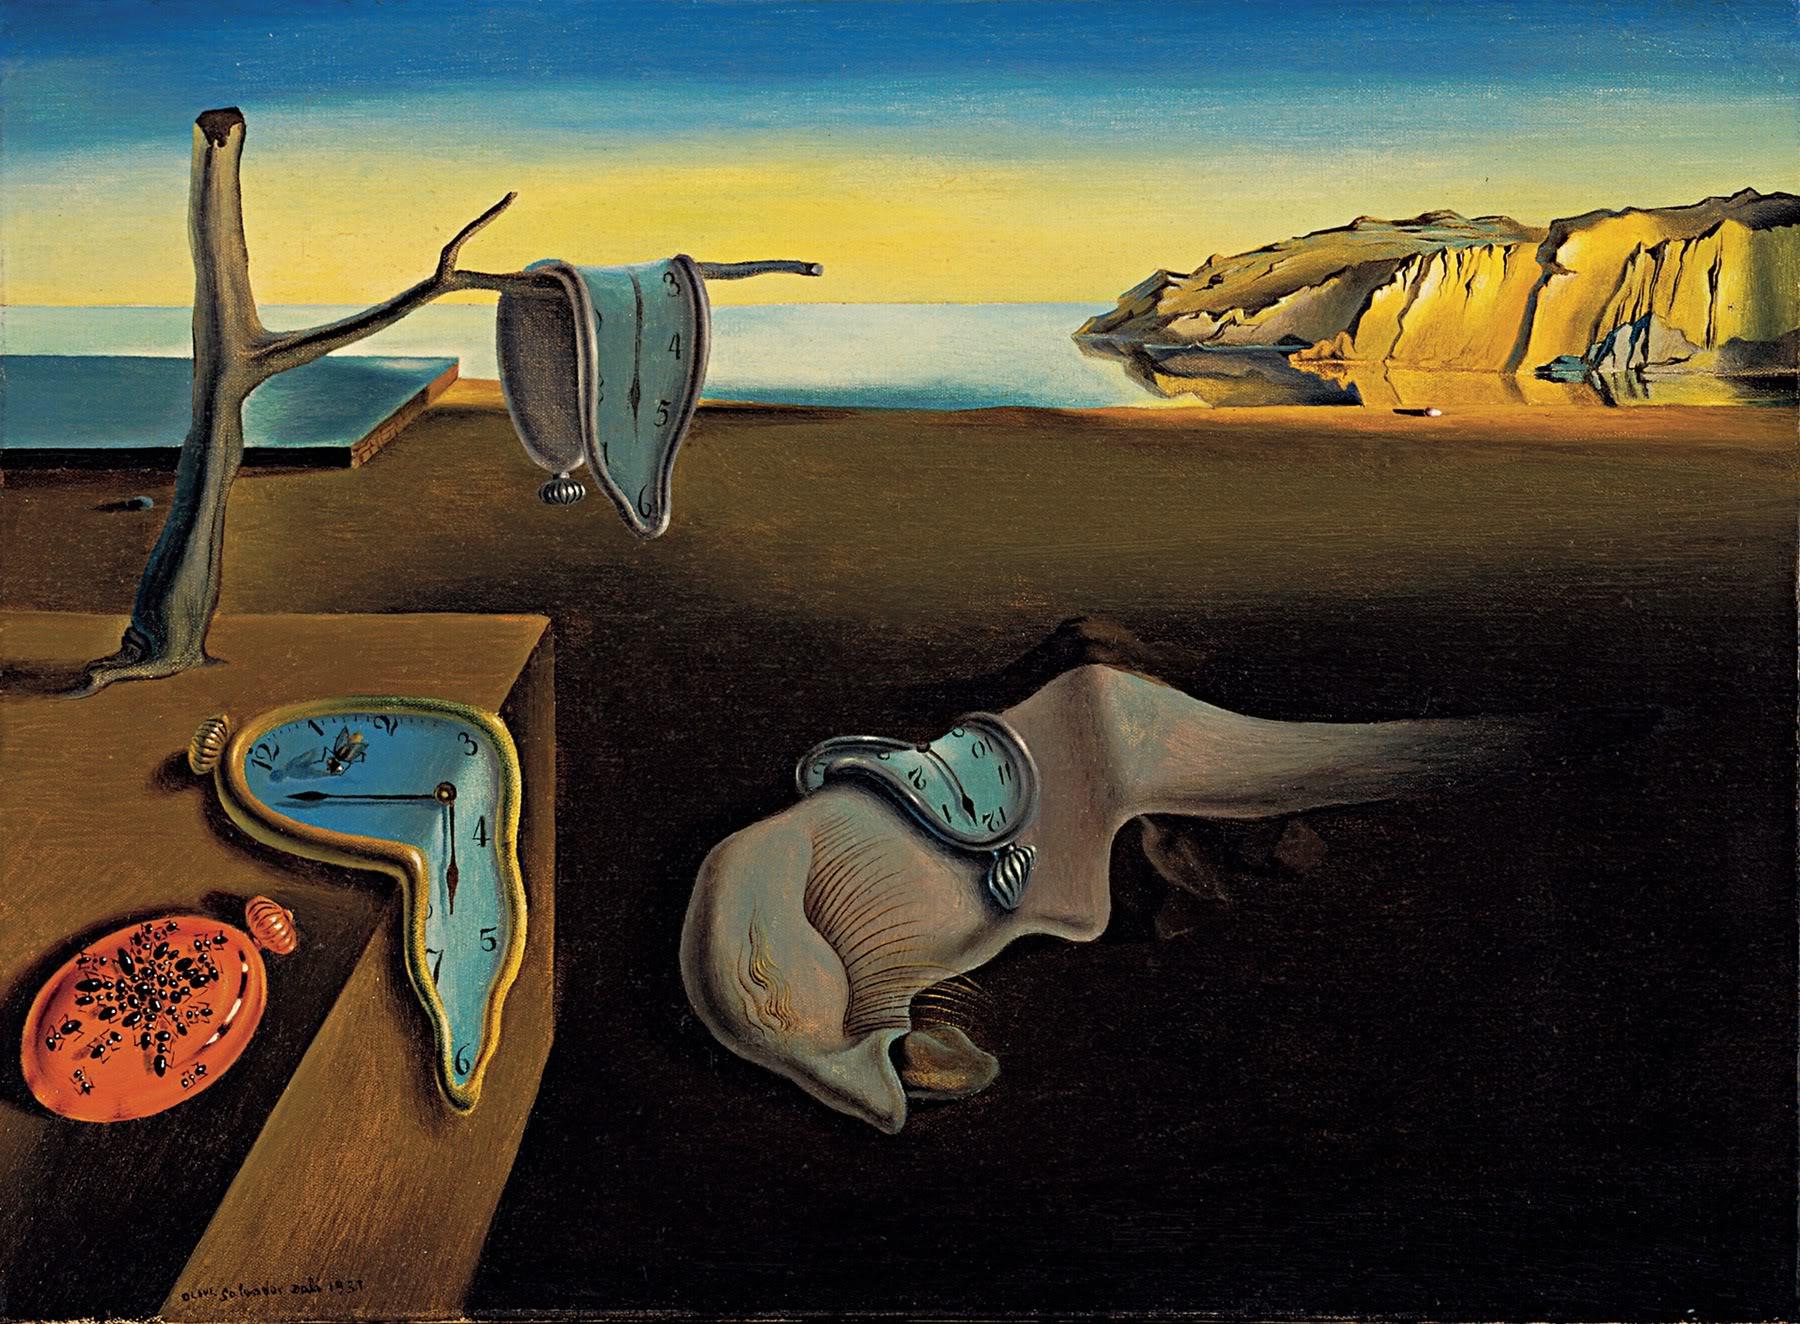 an analysis of venus asleep of paul delvaux The sleeping venus, 1943 by paul delvaux surrealism mythological painting.